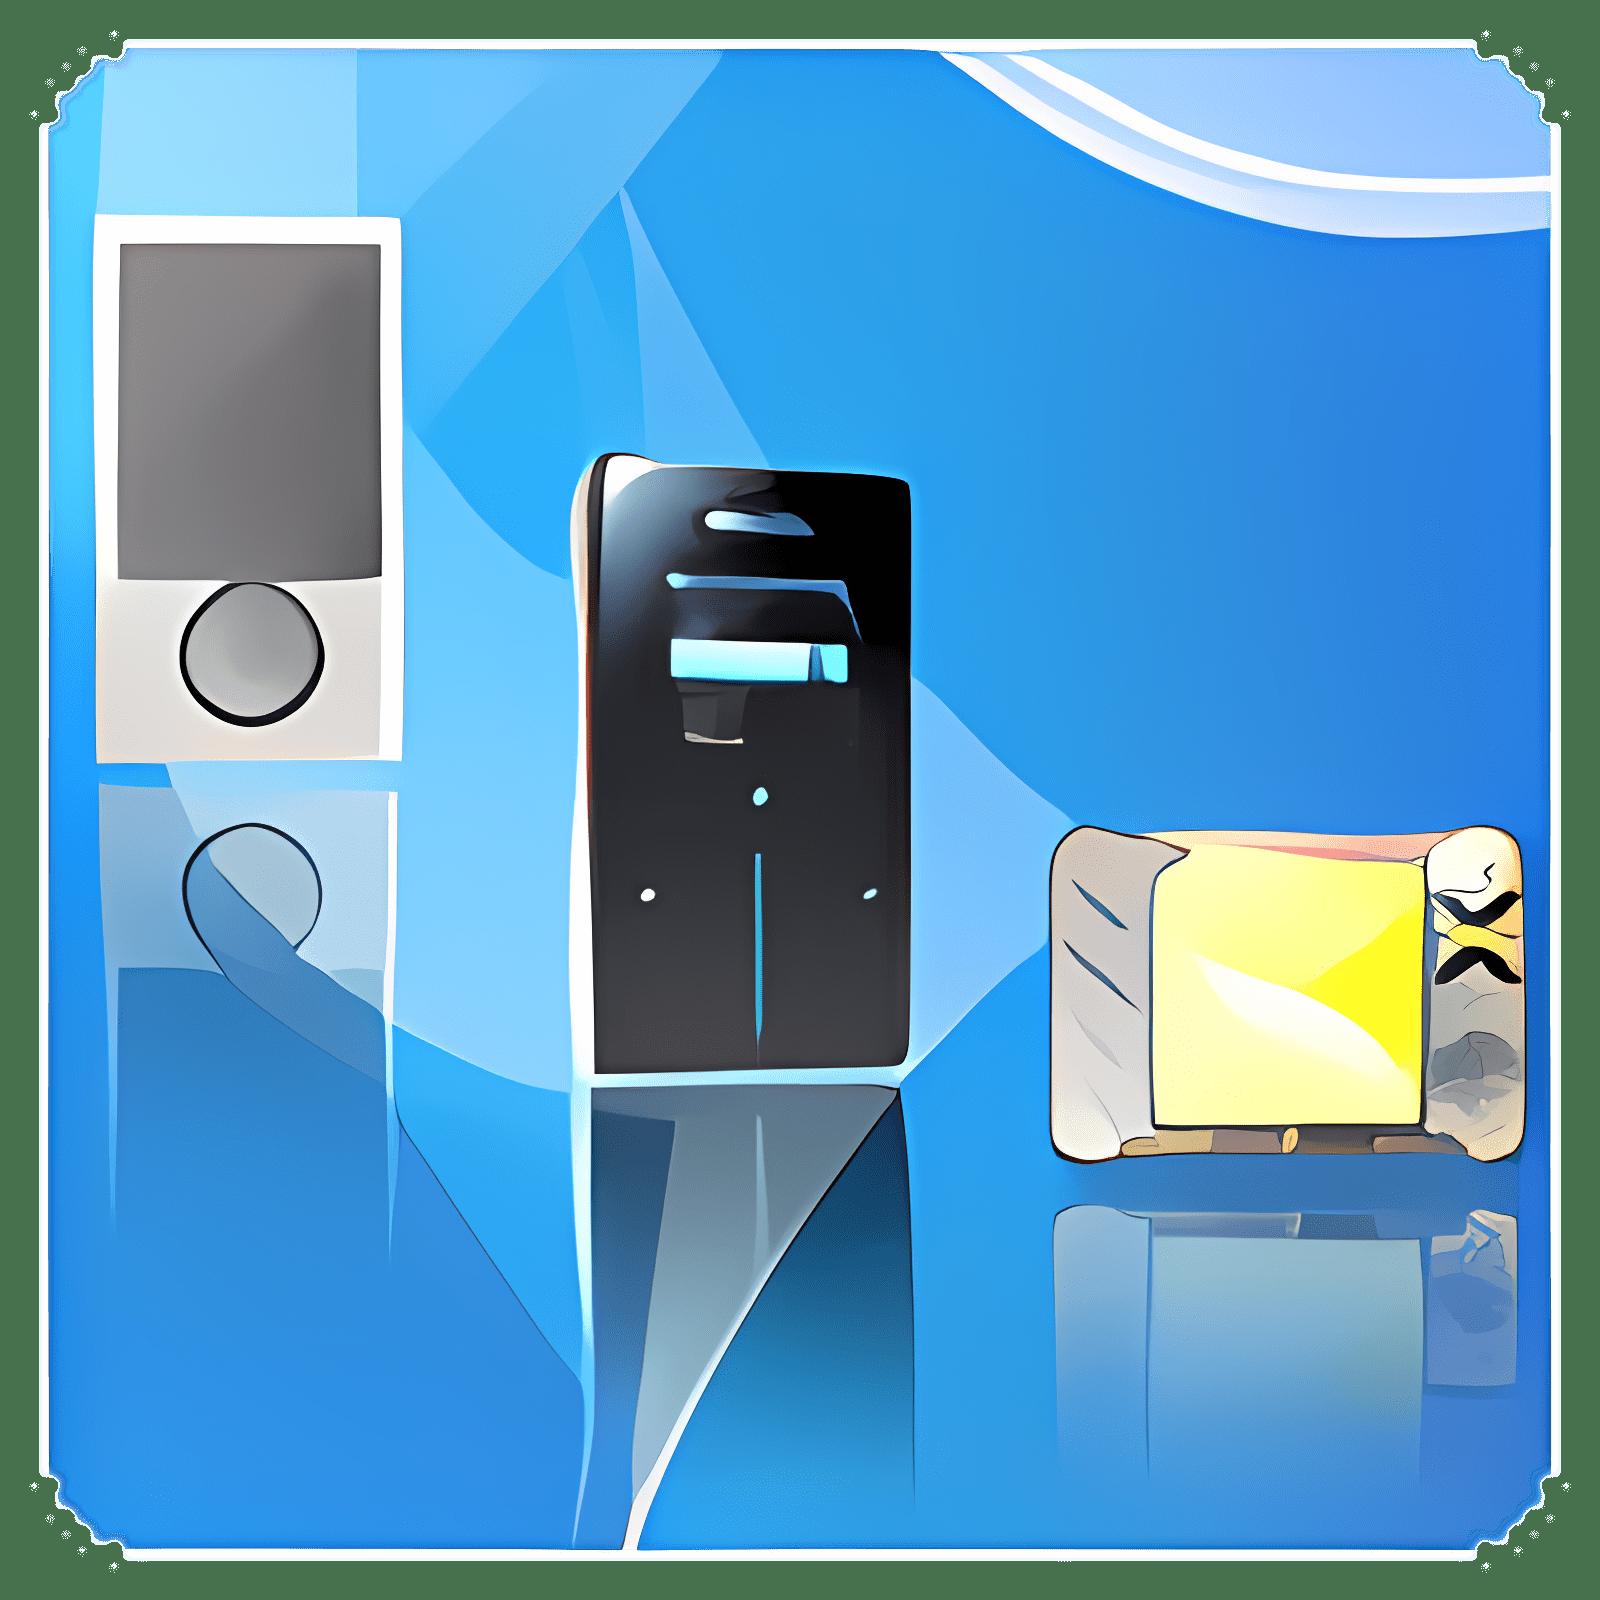 Plato FLV to Video Audio Converter